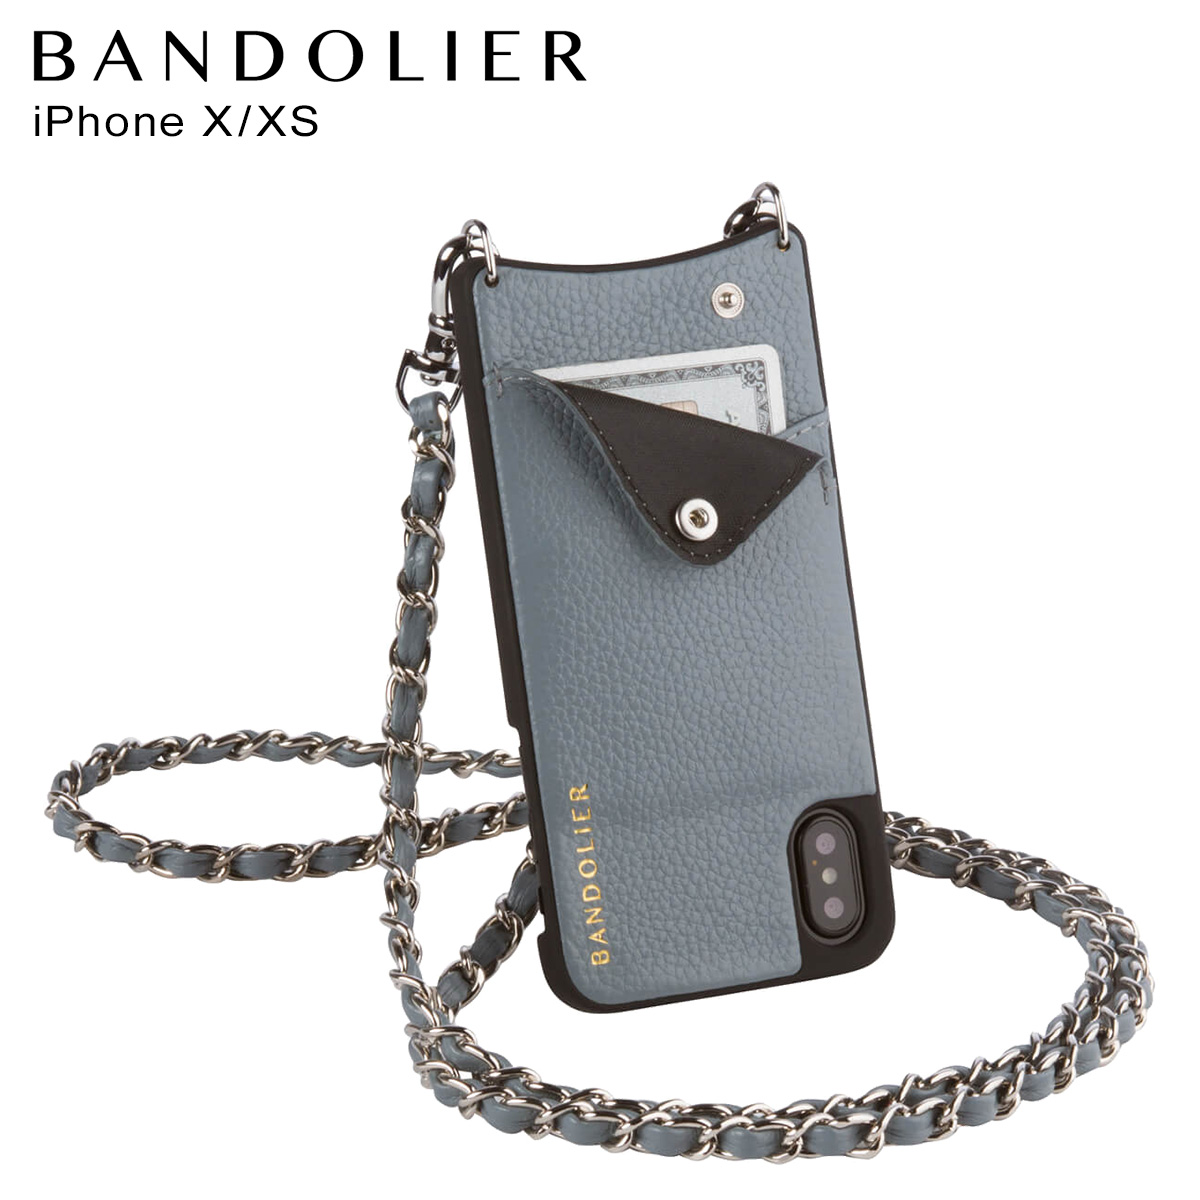 BANDOLIER iPhoneXS X LUCY STORM バンドリヤー ケース スマホ アイフォン メンズ レディース [3/18 再入荷]